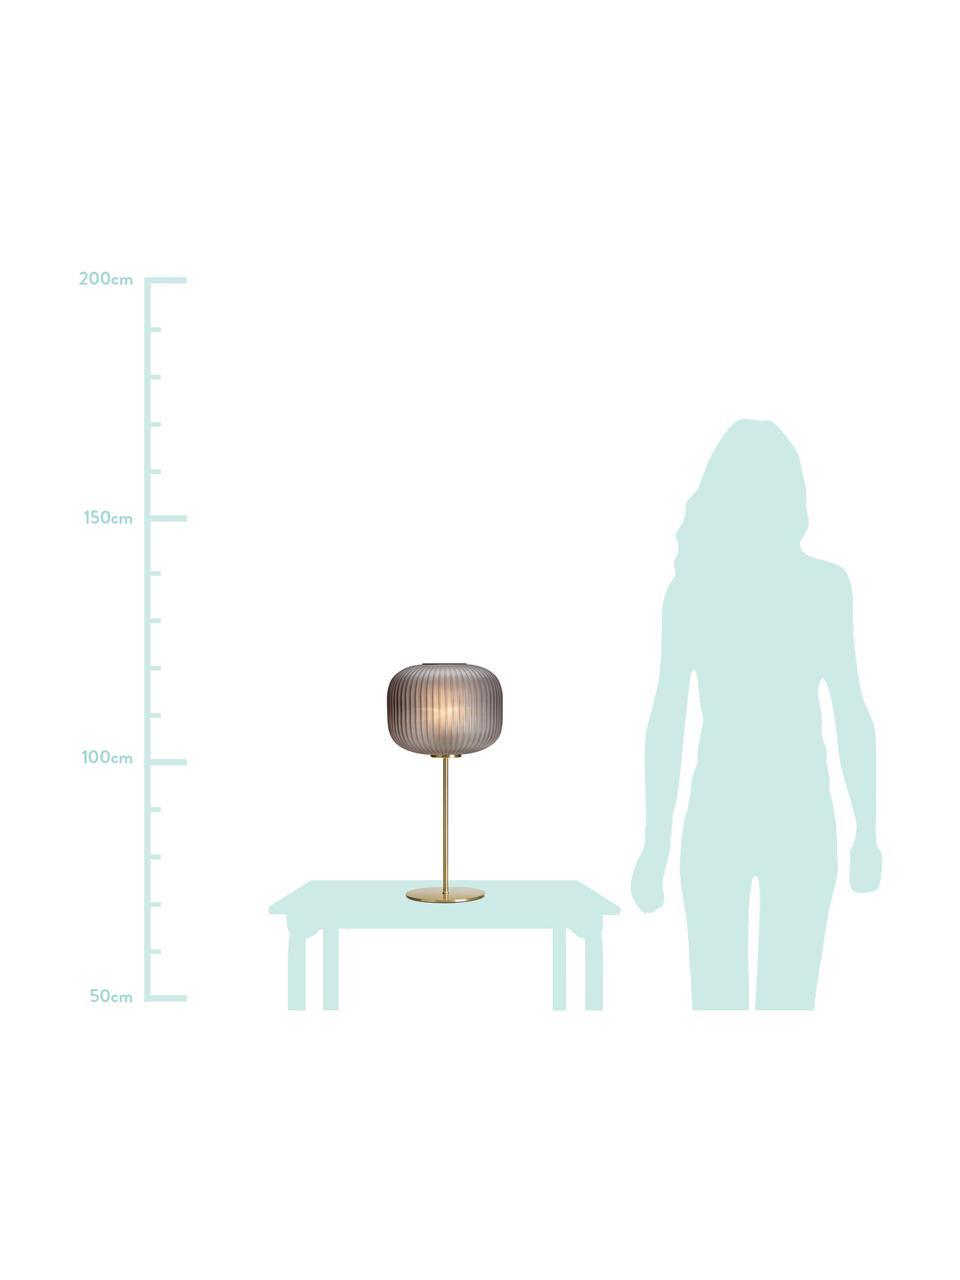 Grote tafellamp Sober met glazen lampenkap, Lampenkap: glas, Lampvoet: geborsteld metaal, Grijs, messingkleurig, Ø 25 x H 50 cm